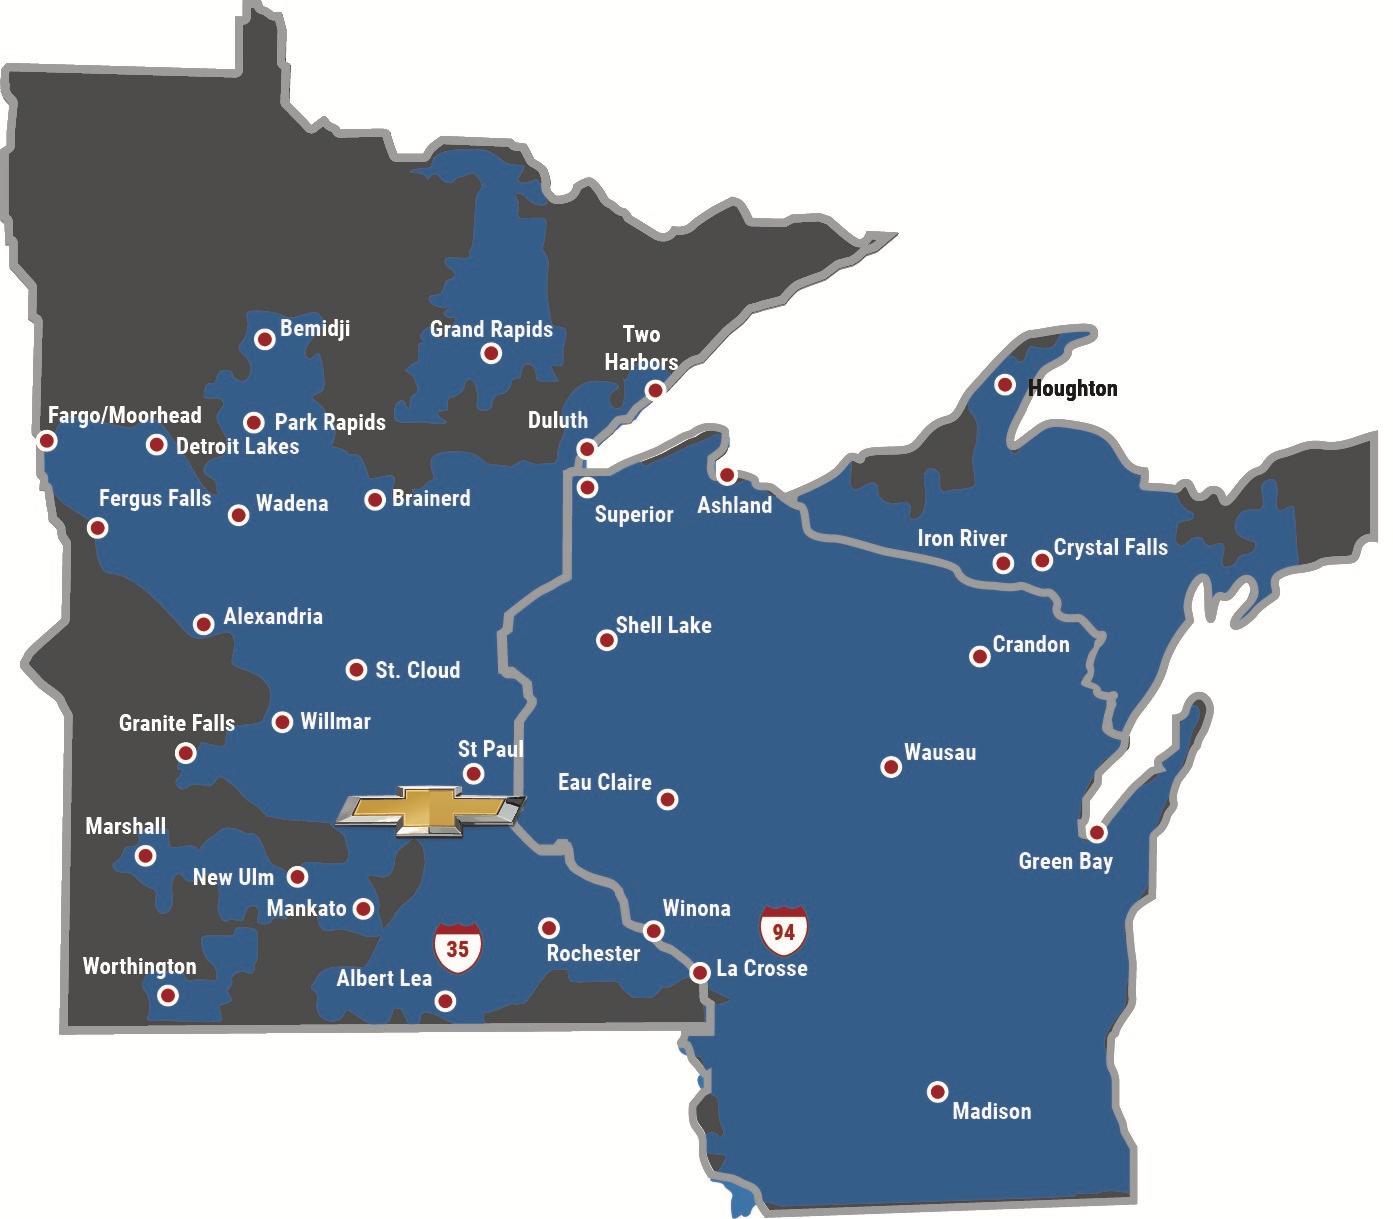 collision map